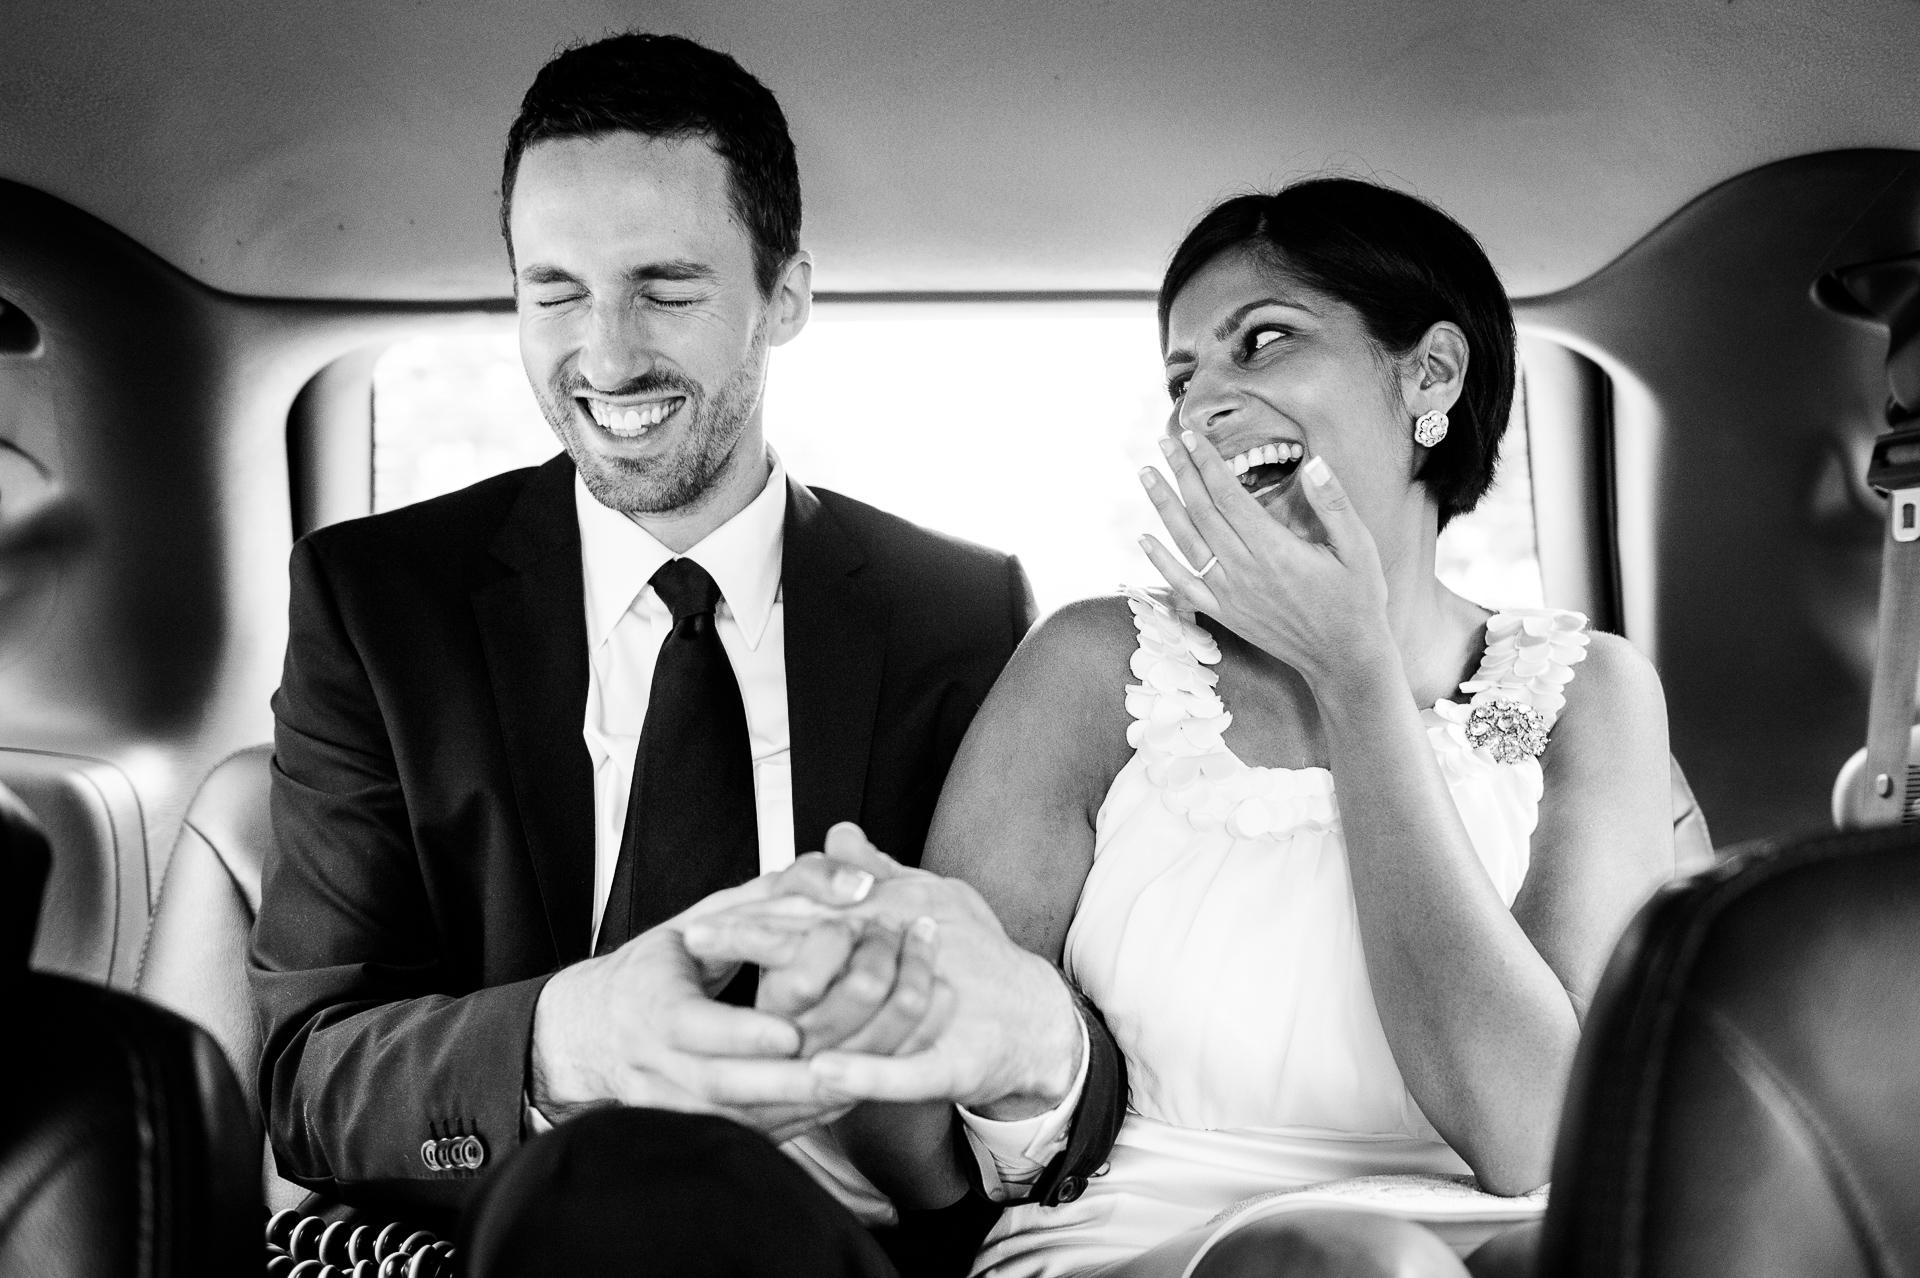 Imagen de boda de BW desde un taxi - Washington, DC | Al mediodía, terminaron